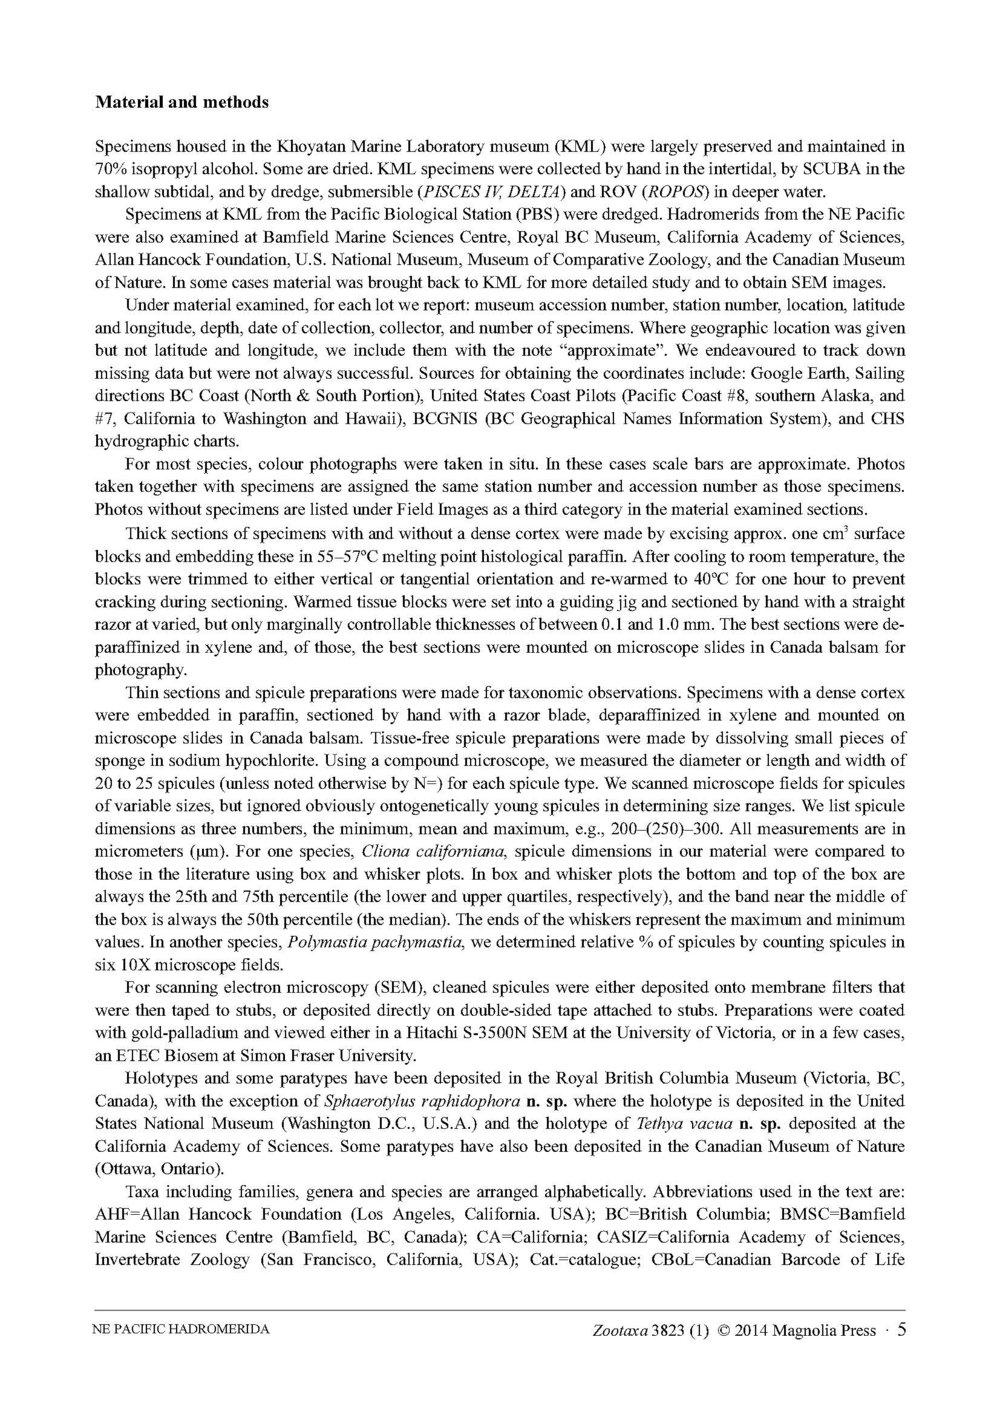 Austin et al 2014 NE Pacific Hadromerids_Page_05.jpg